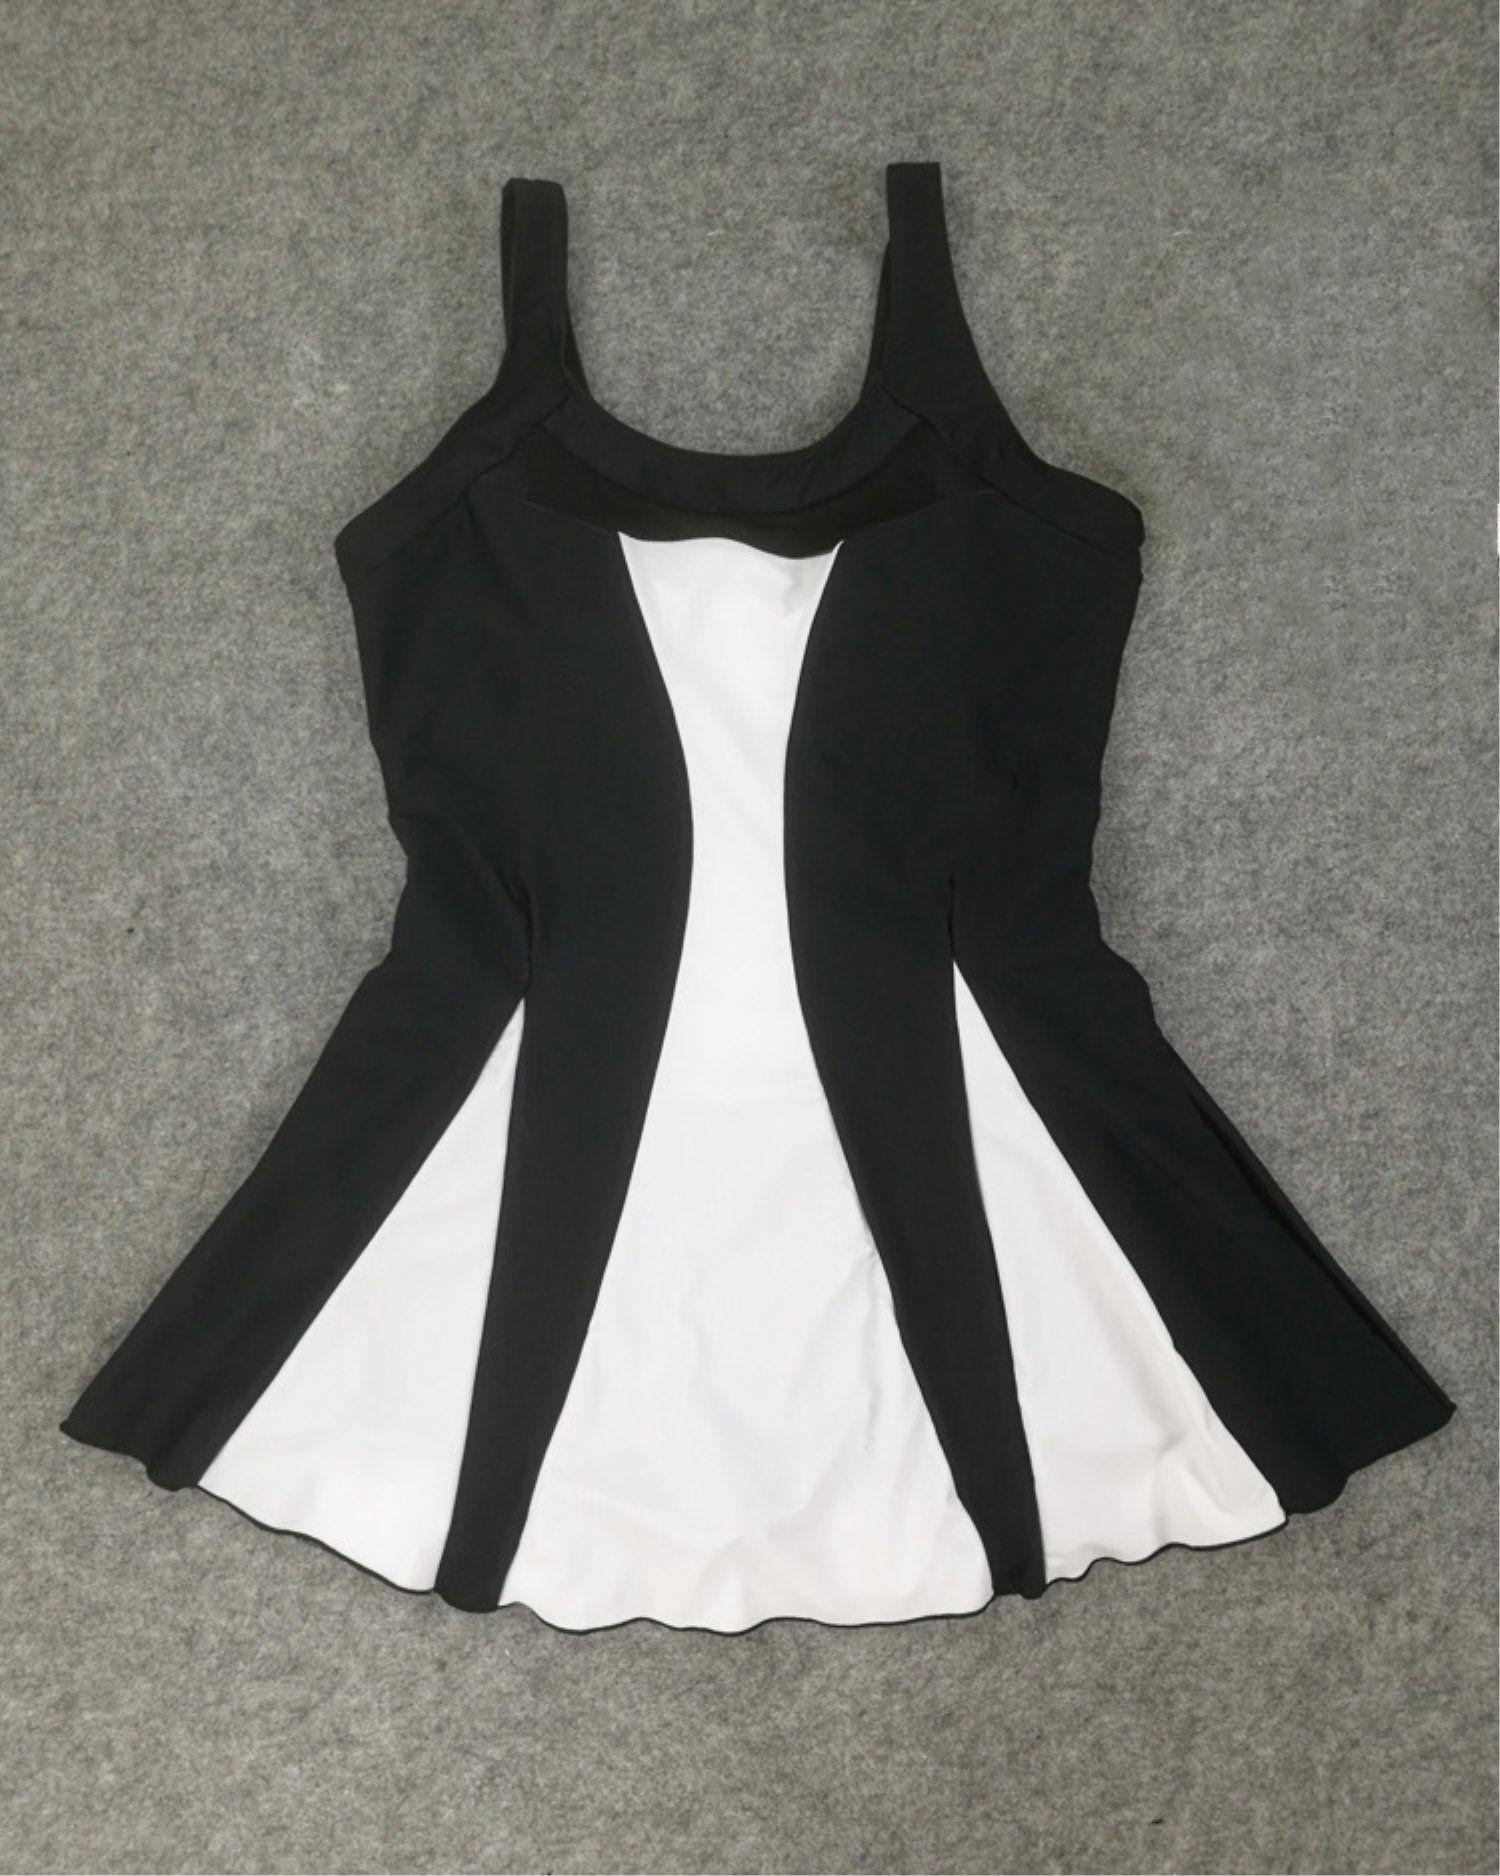 c8196ab844d14 Women One Piece Swimdress Tummy Control Swim Dress Swimwear Slimming Skirt  Swimsuits Bathing Suit Dress >>> Read more at the image link. (Note:Amazon  ...